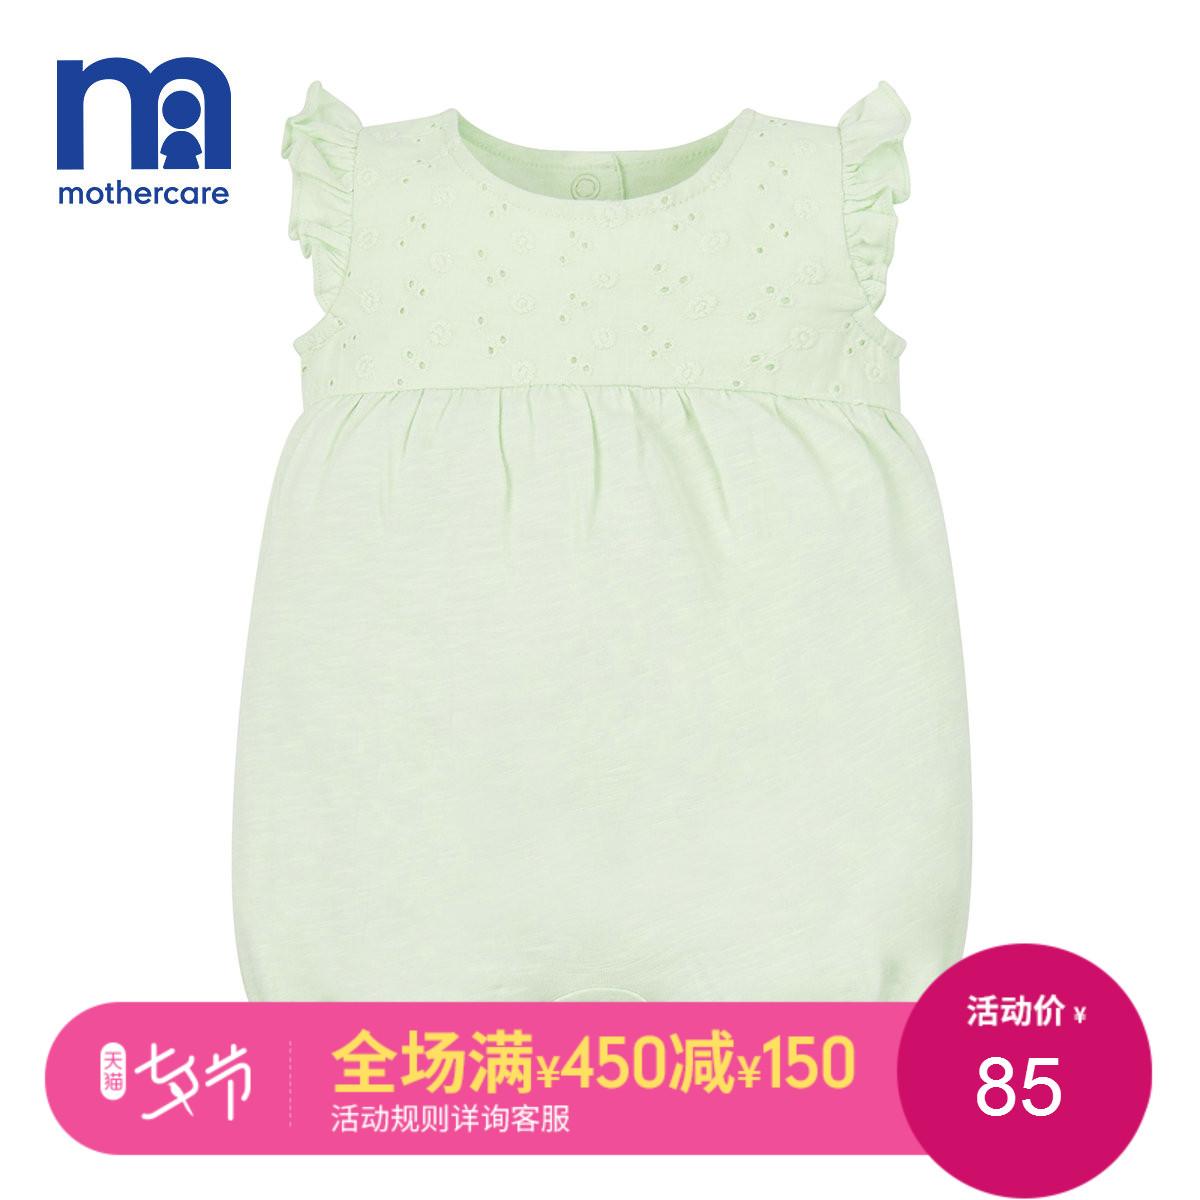 mothercare新生的儿宝宝衣服夏女婴儿薄款棉质飞边袖刺绣小花哈衣